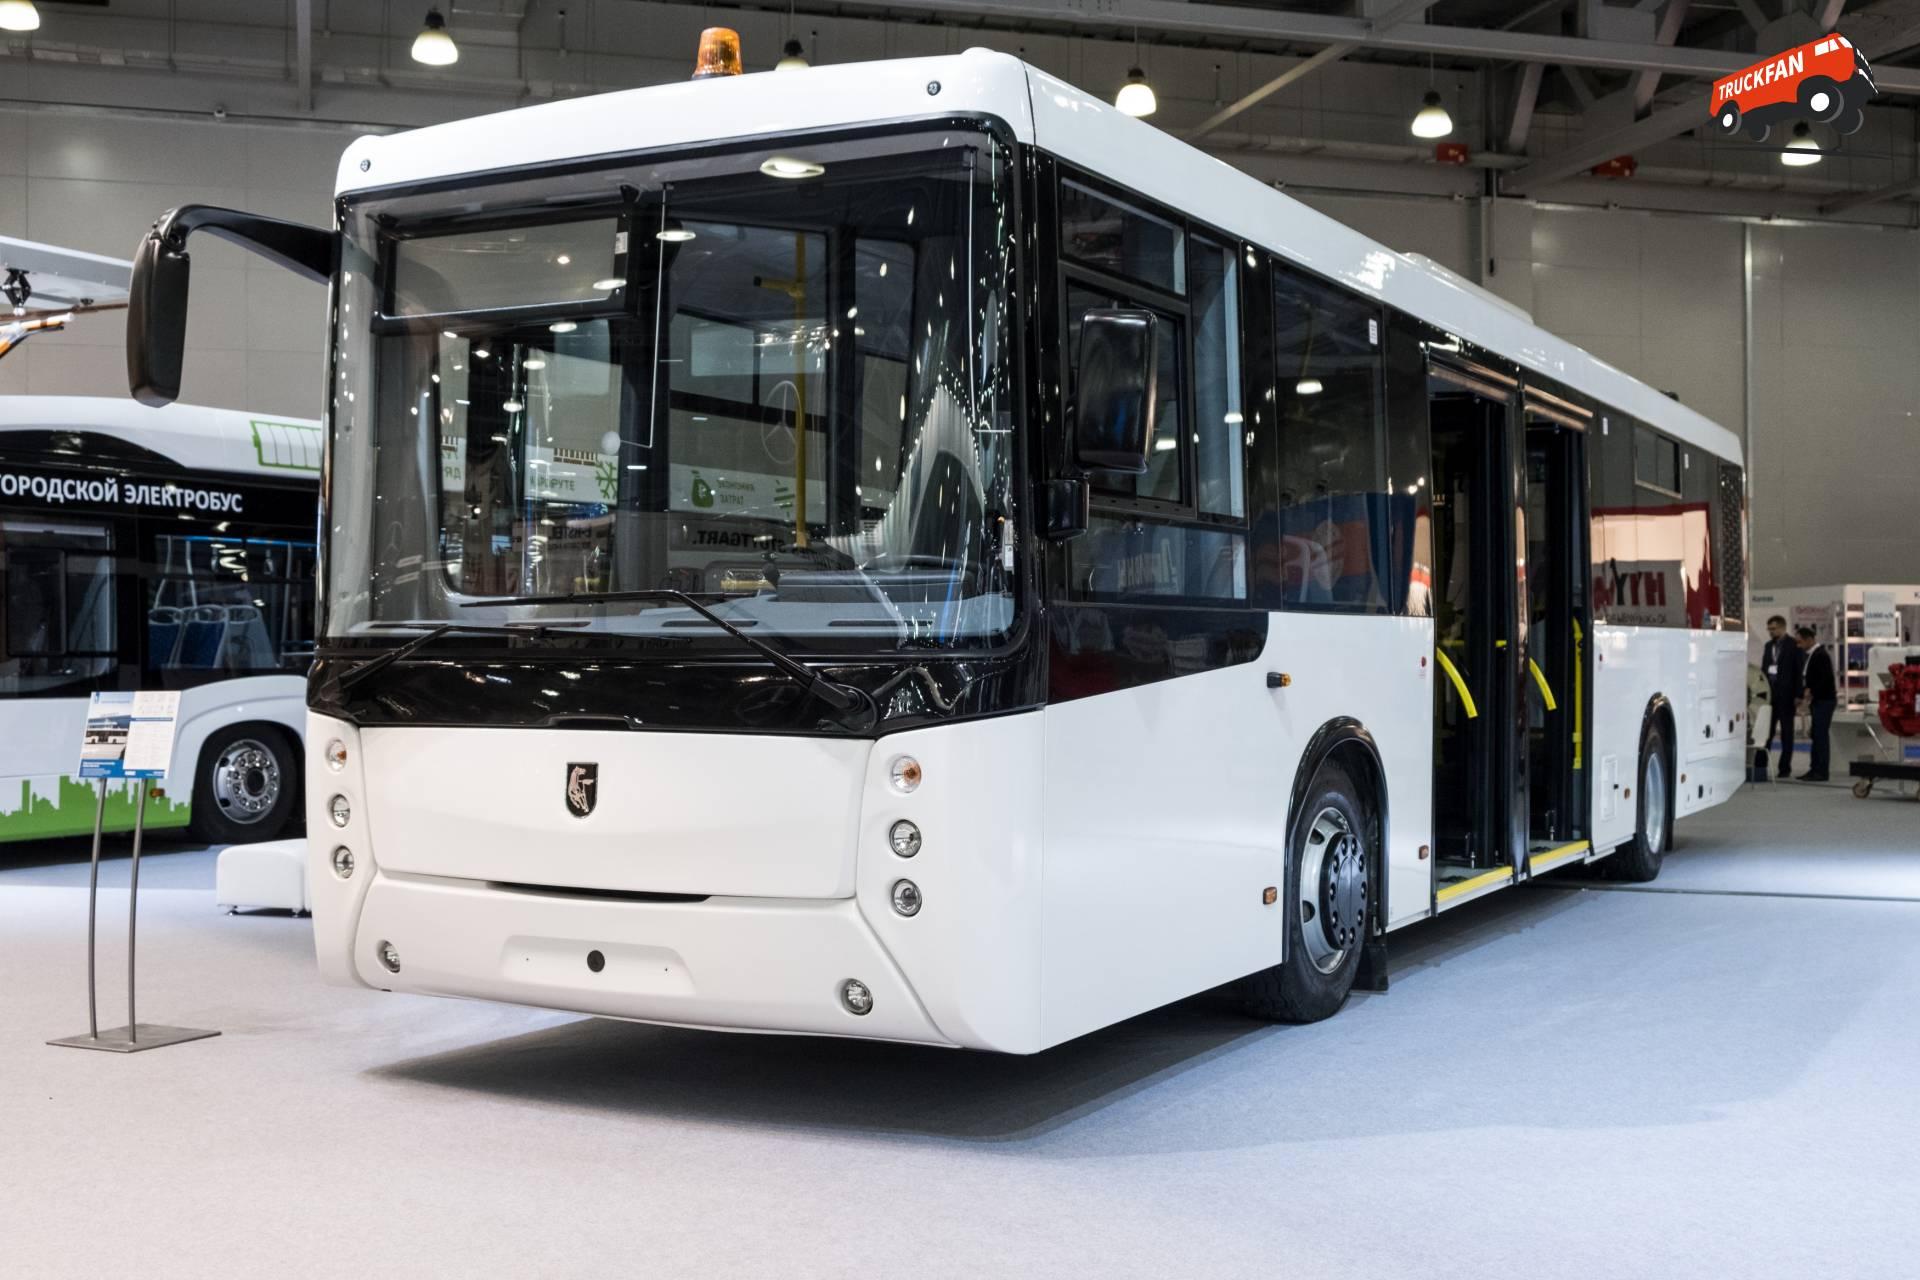 Kamaz bus